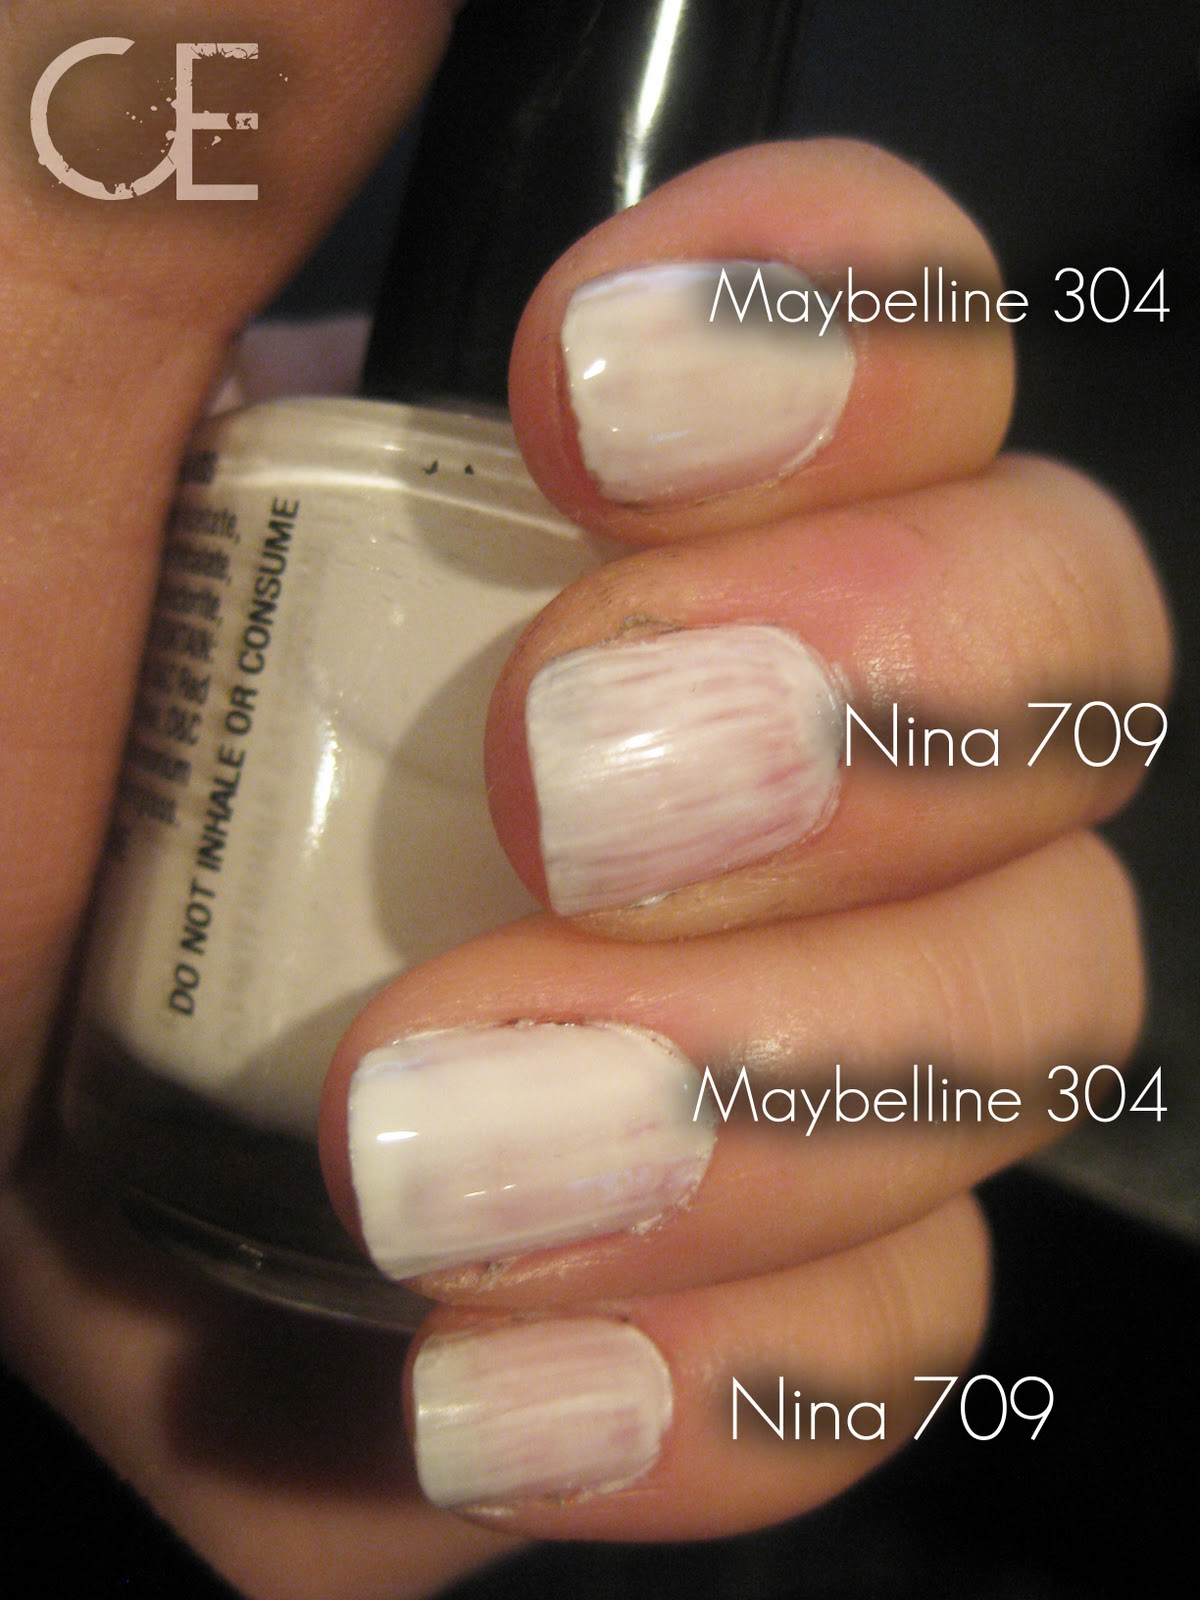 Makeup Etc Versus White Nail Polish